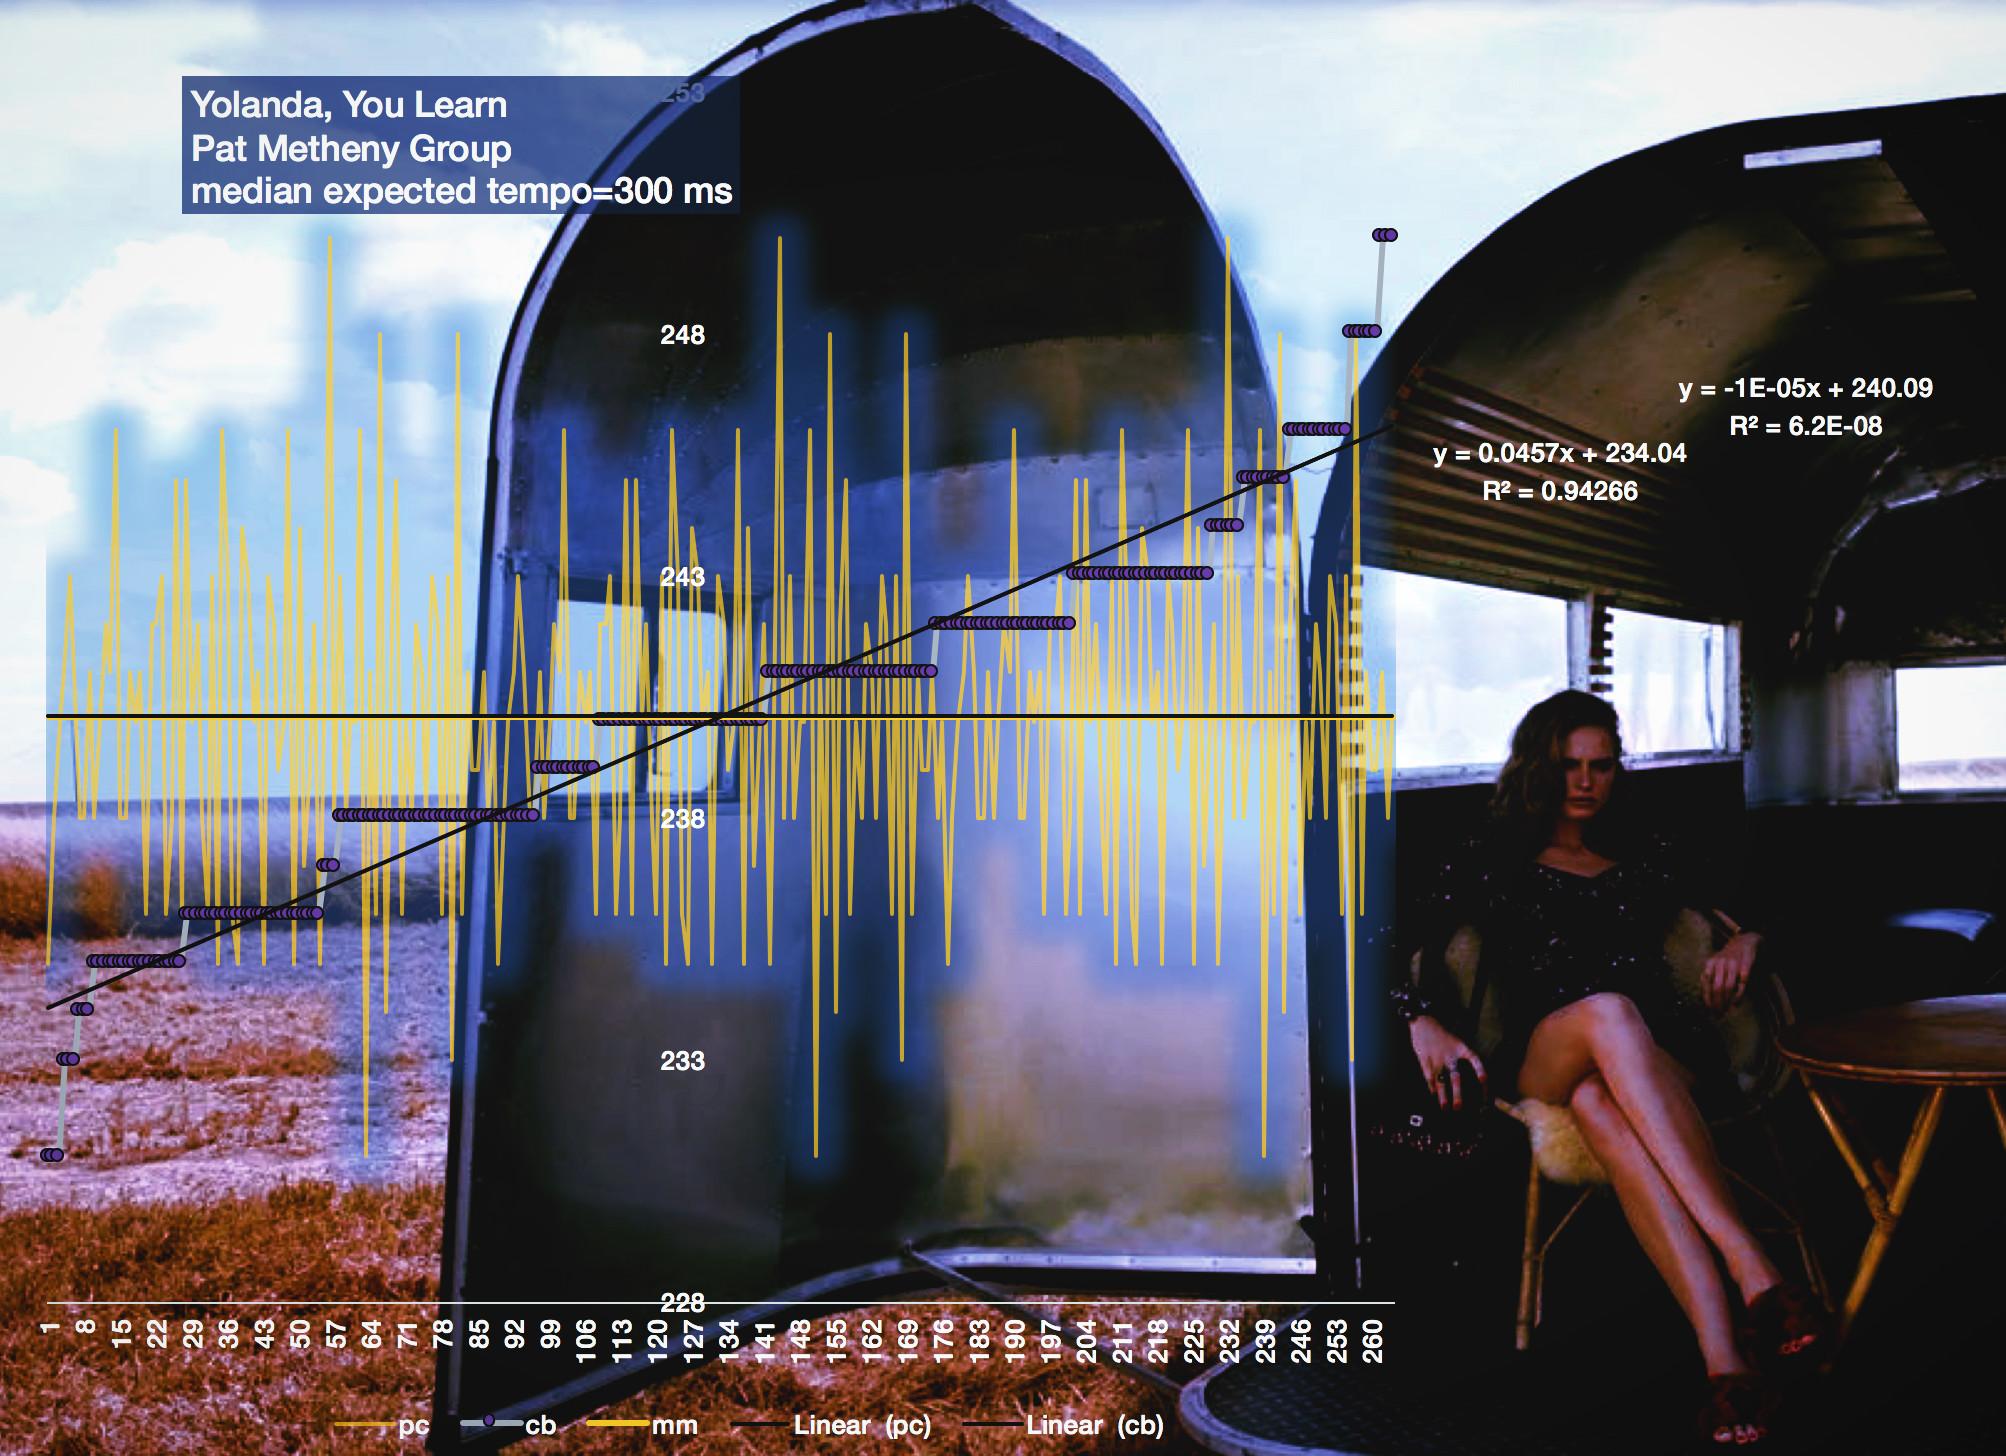 Pat-Metheny-Yolanda-You-Learn-harmonic-tempo-probability-chart